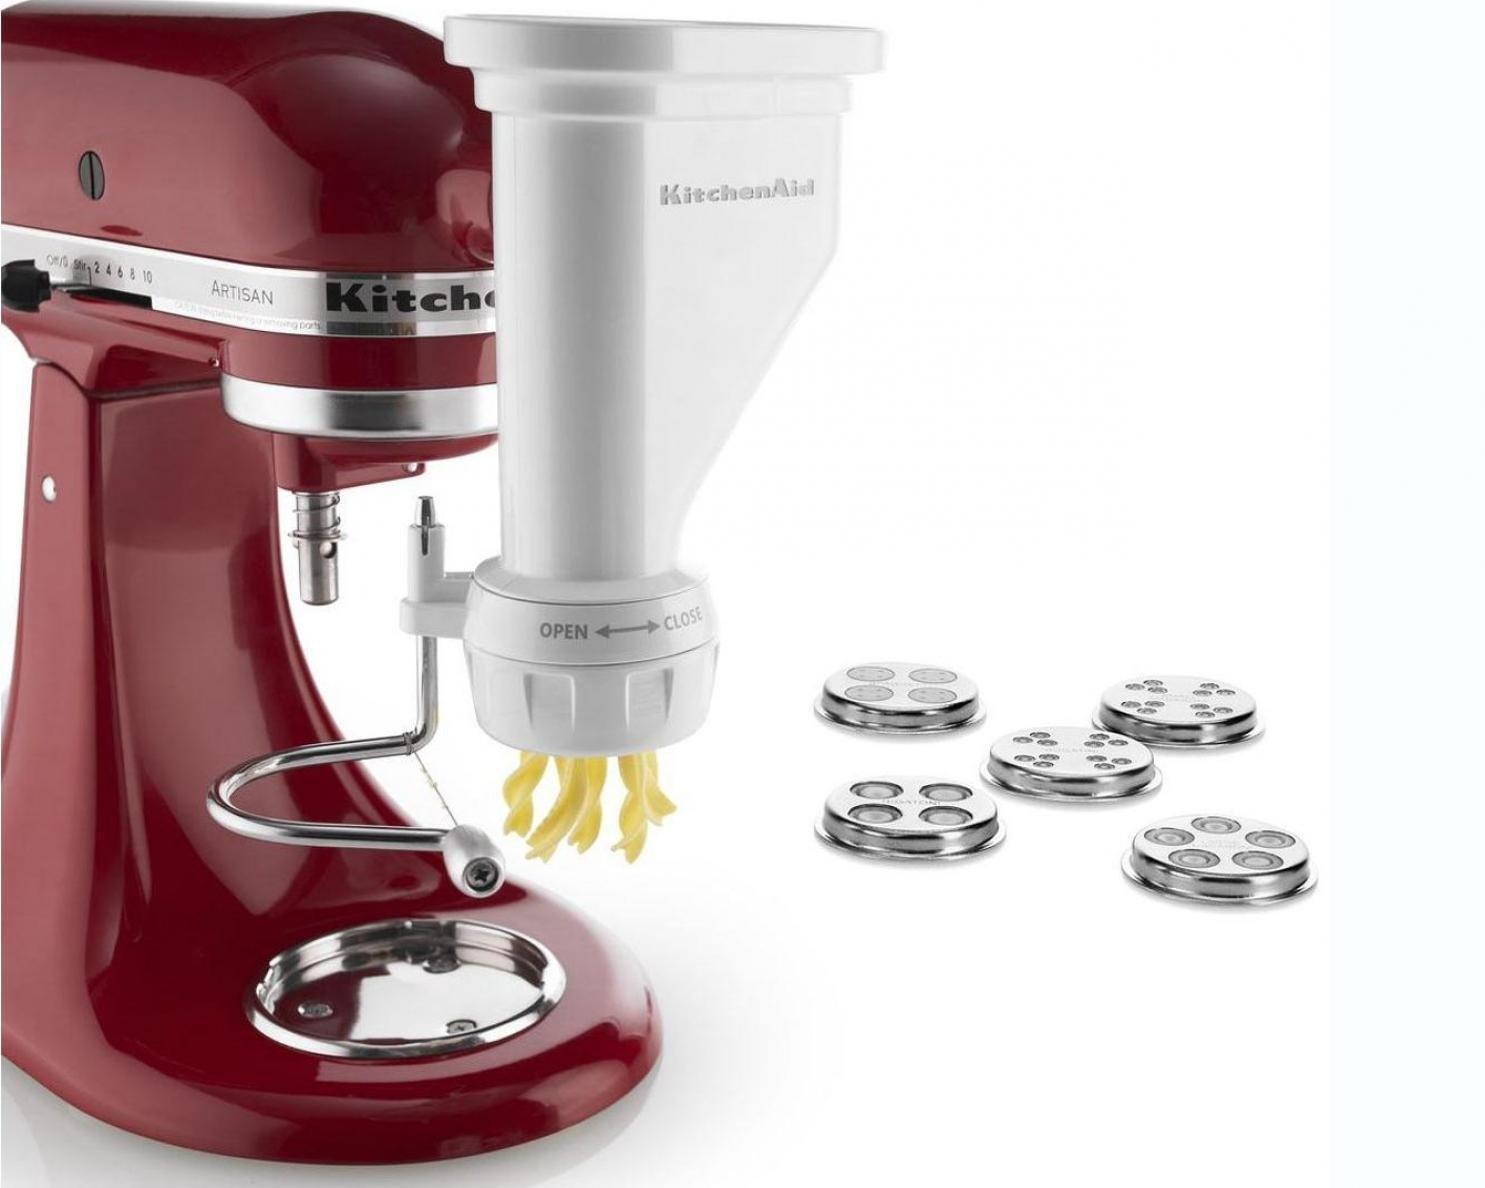 20 Amazing Kitchen Aid Mixer Attachments | www.onecrazyhouse.com